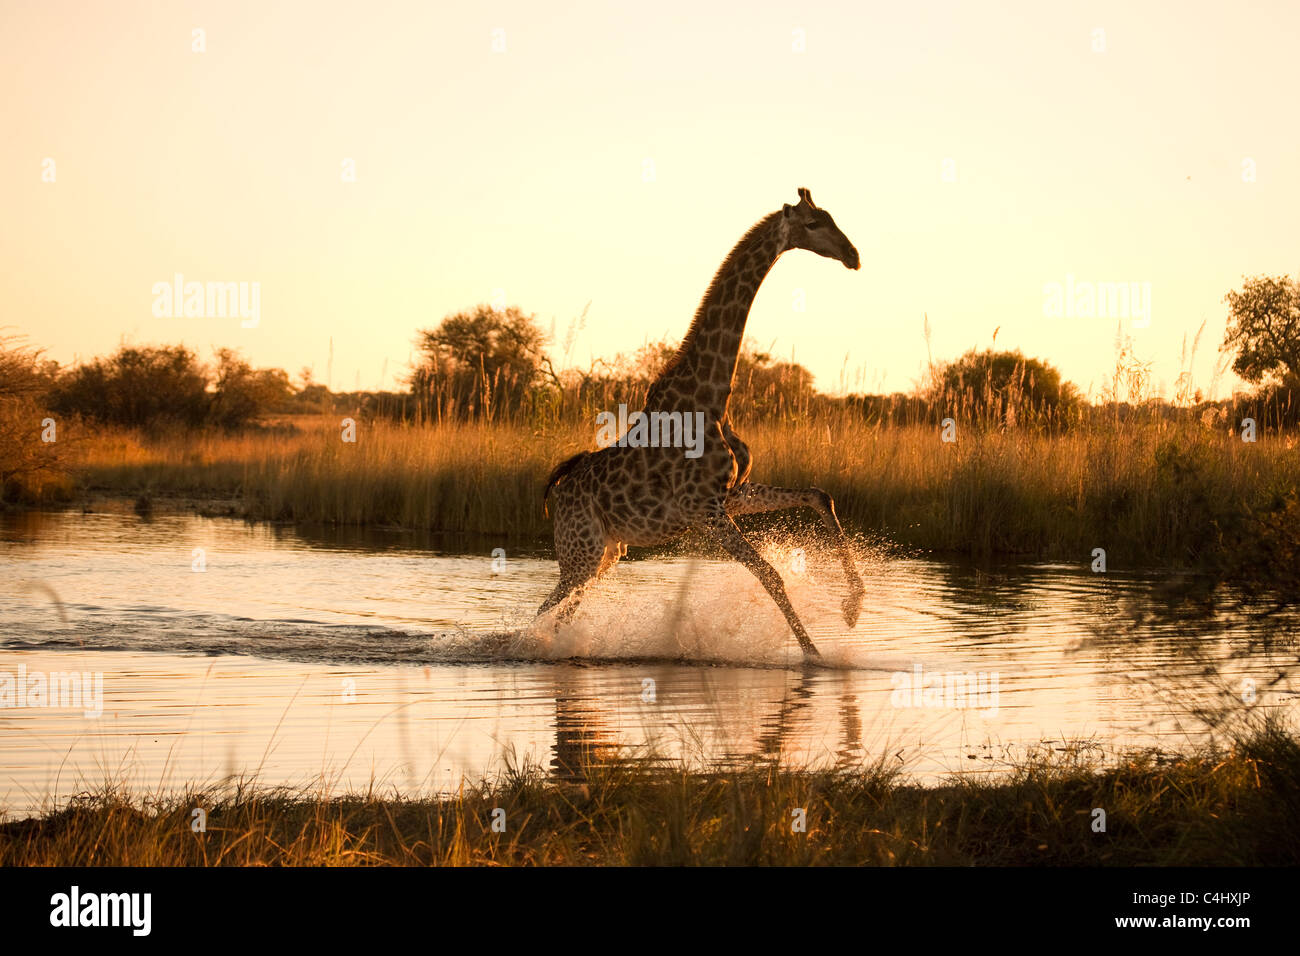 Giraffe (Giraffa camelopardalis) Running over a Flooded area in the Okavango Delta, Botswana - Stock Image